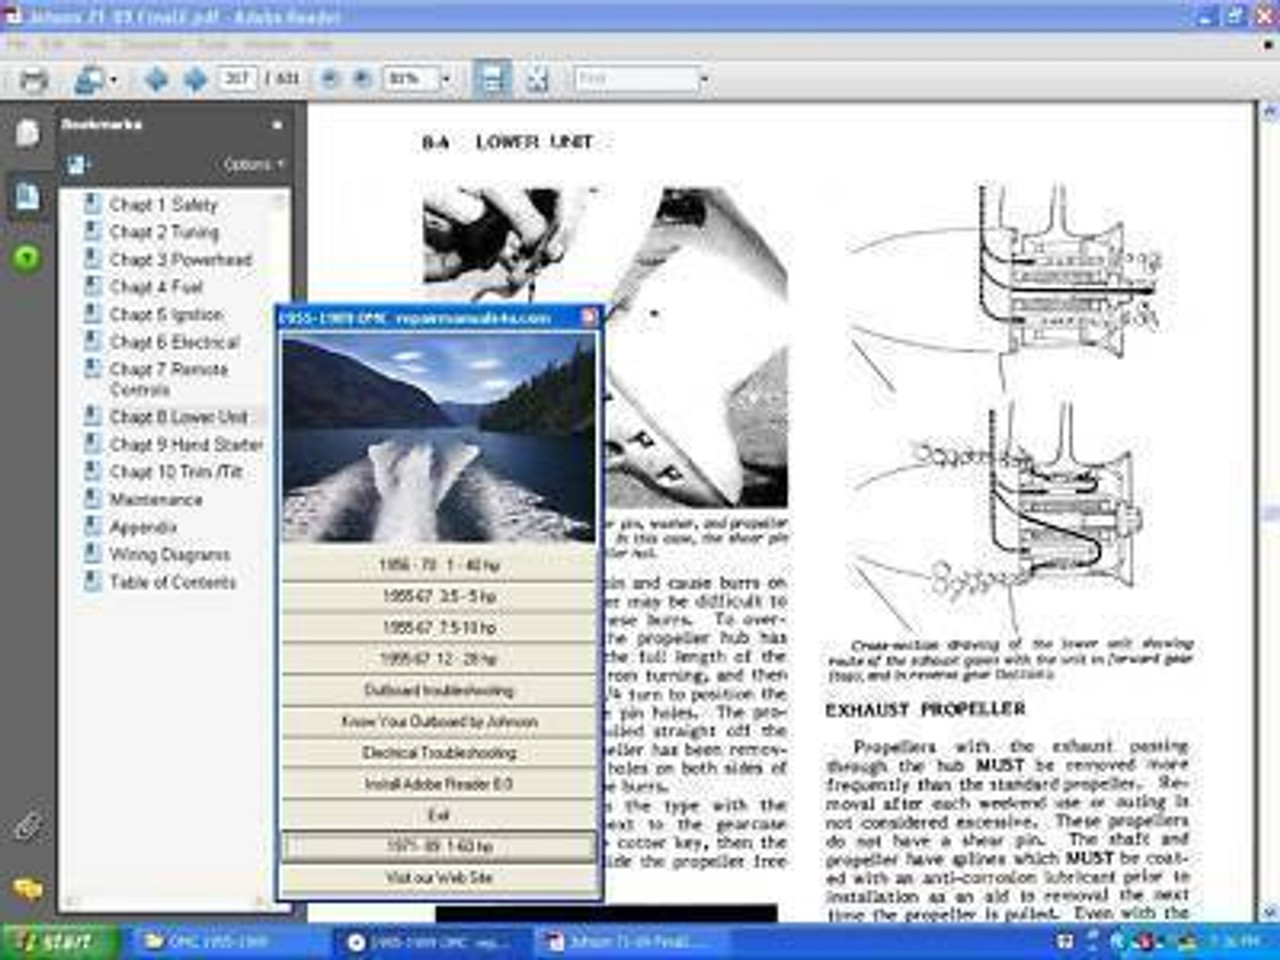 Sea rayder n bayliner razz jet boat service repair manual 90 / 120.